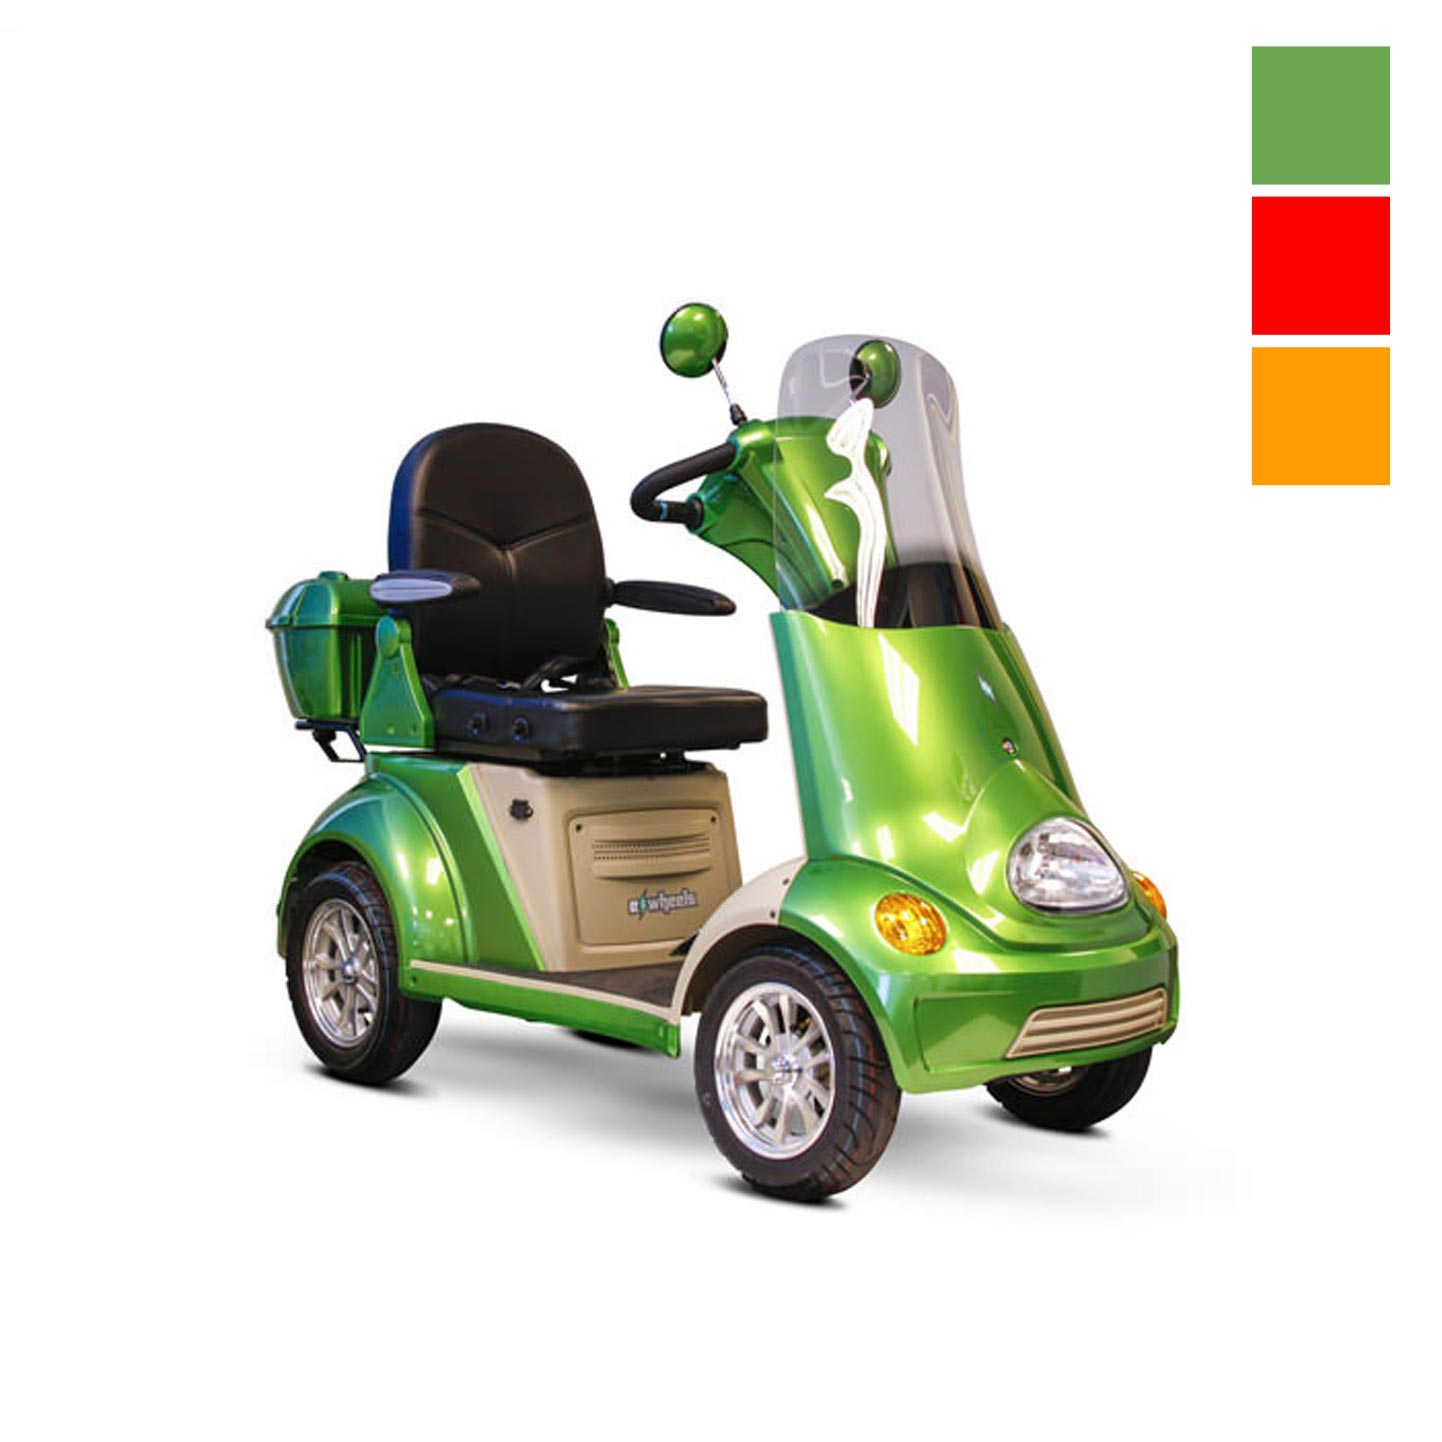 EWheels EW-52 Full Size 4-wheel mobility scooter